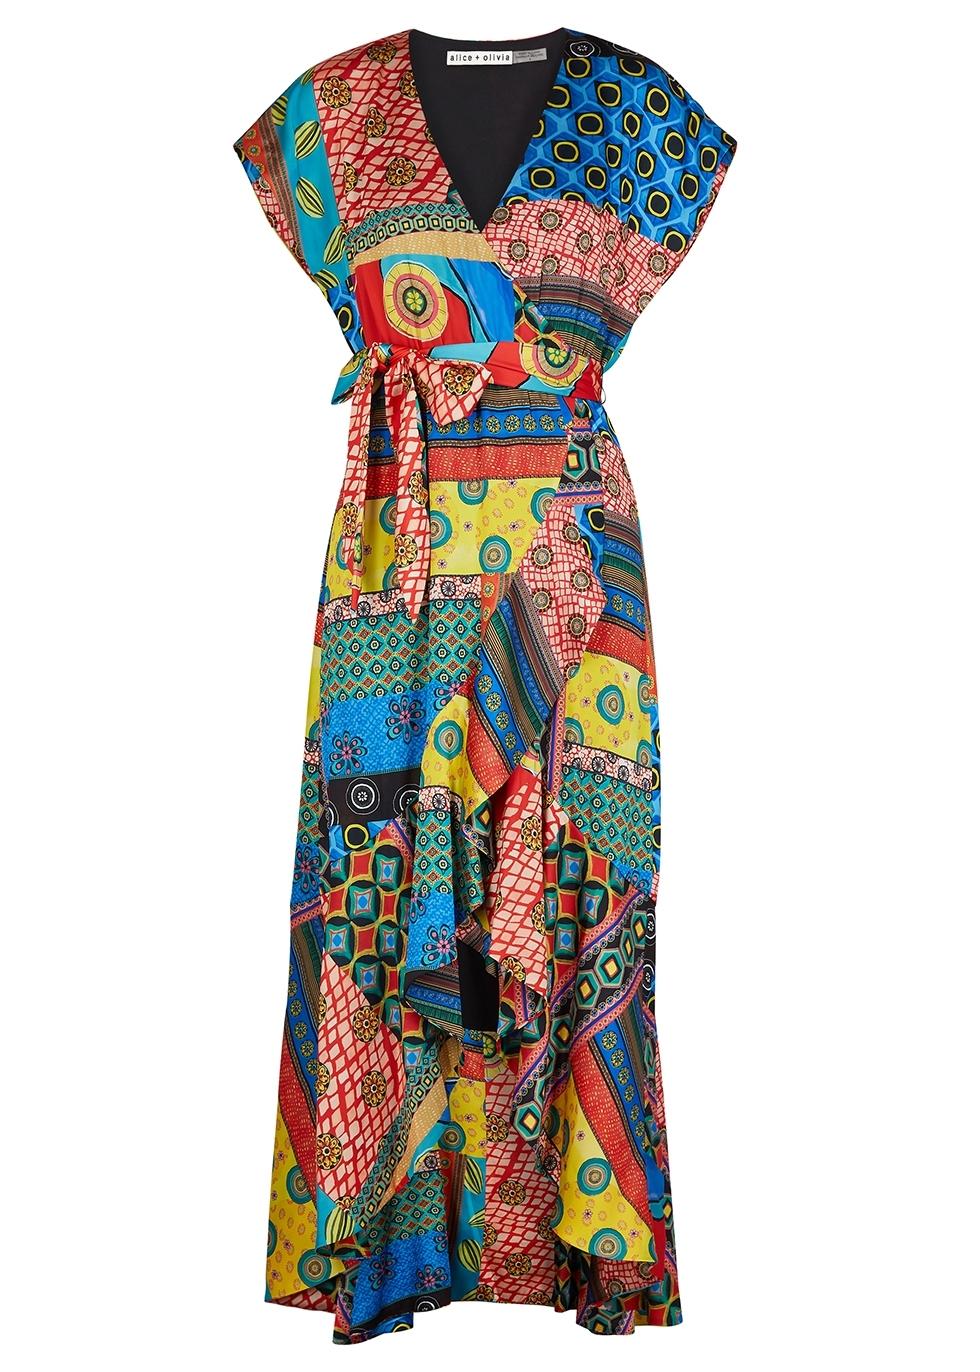 628727e2 Harvey Nichols - Designer Fashion, Beauty, Food & Wine